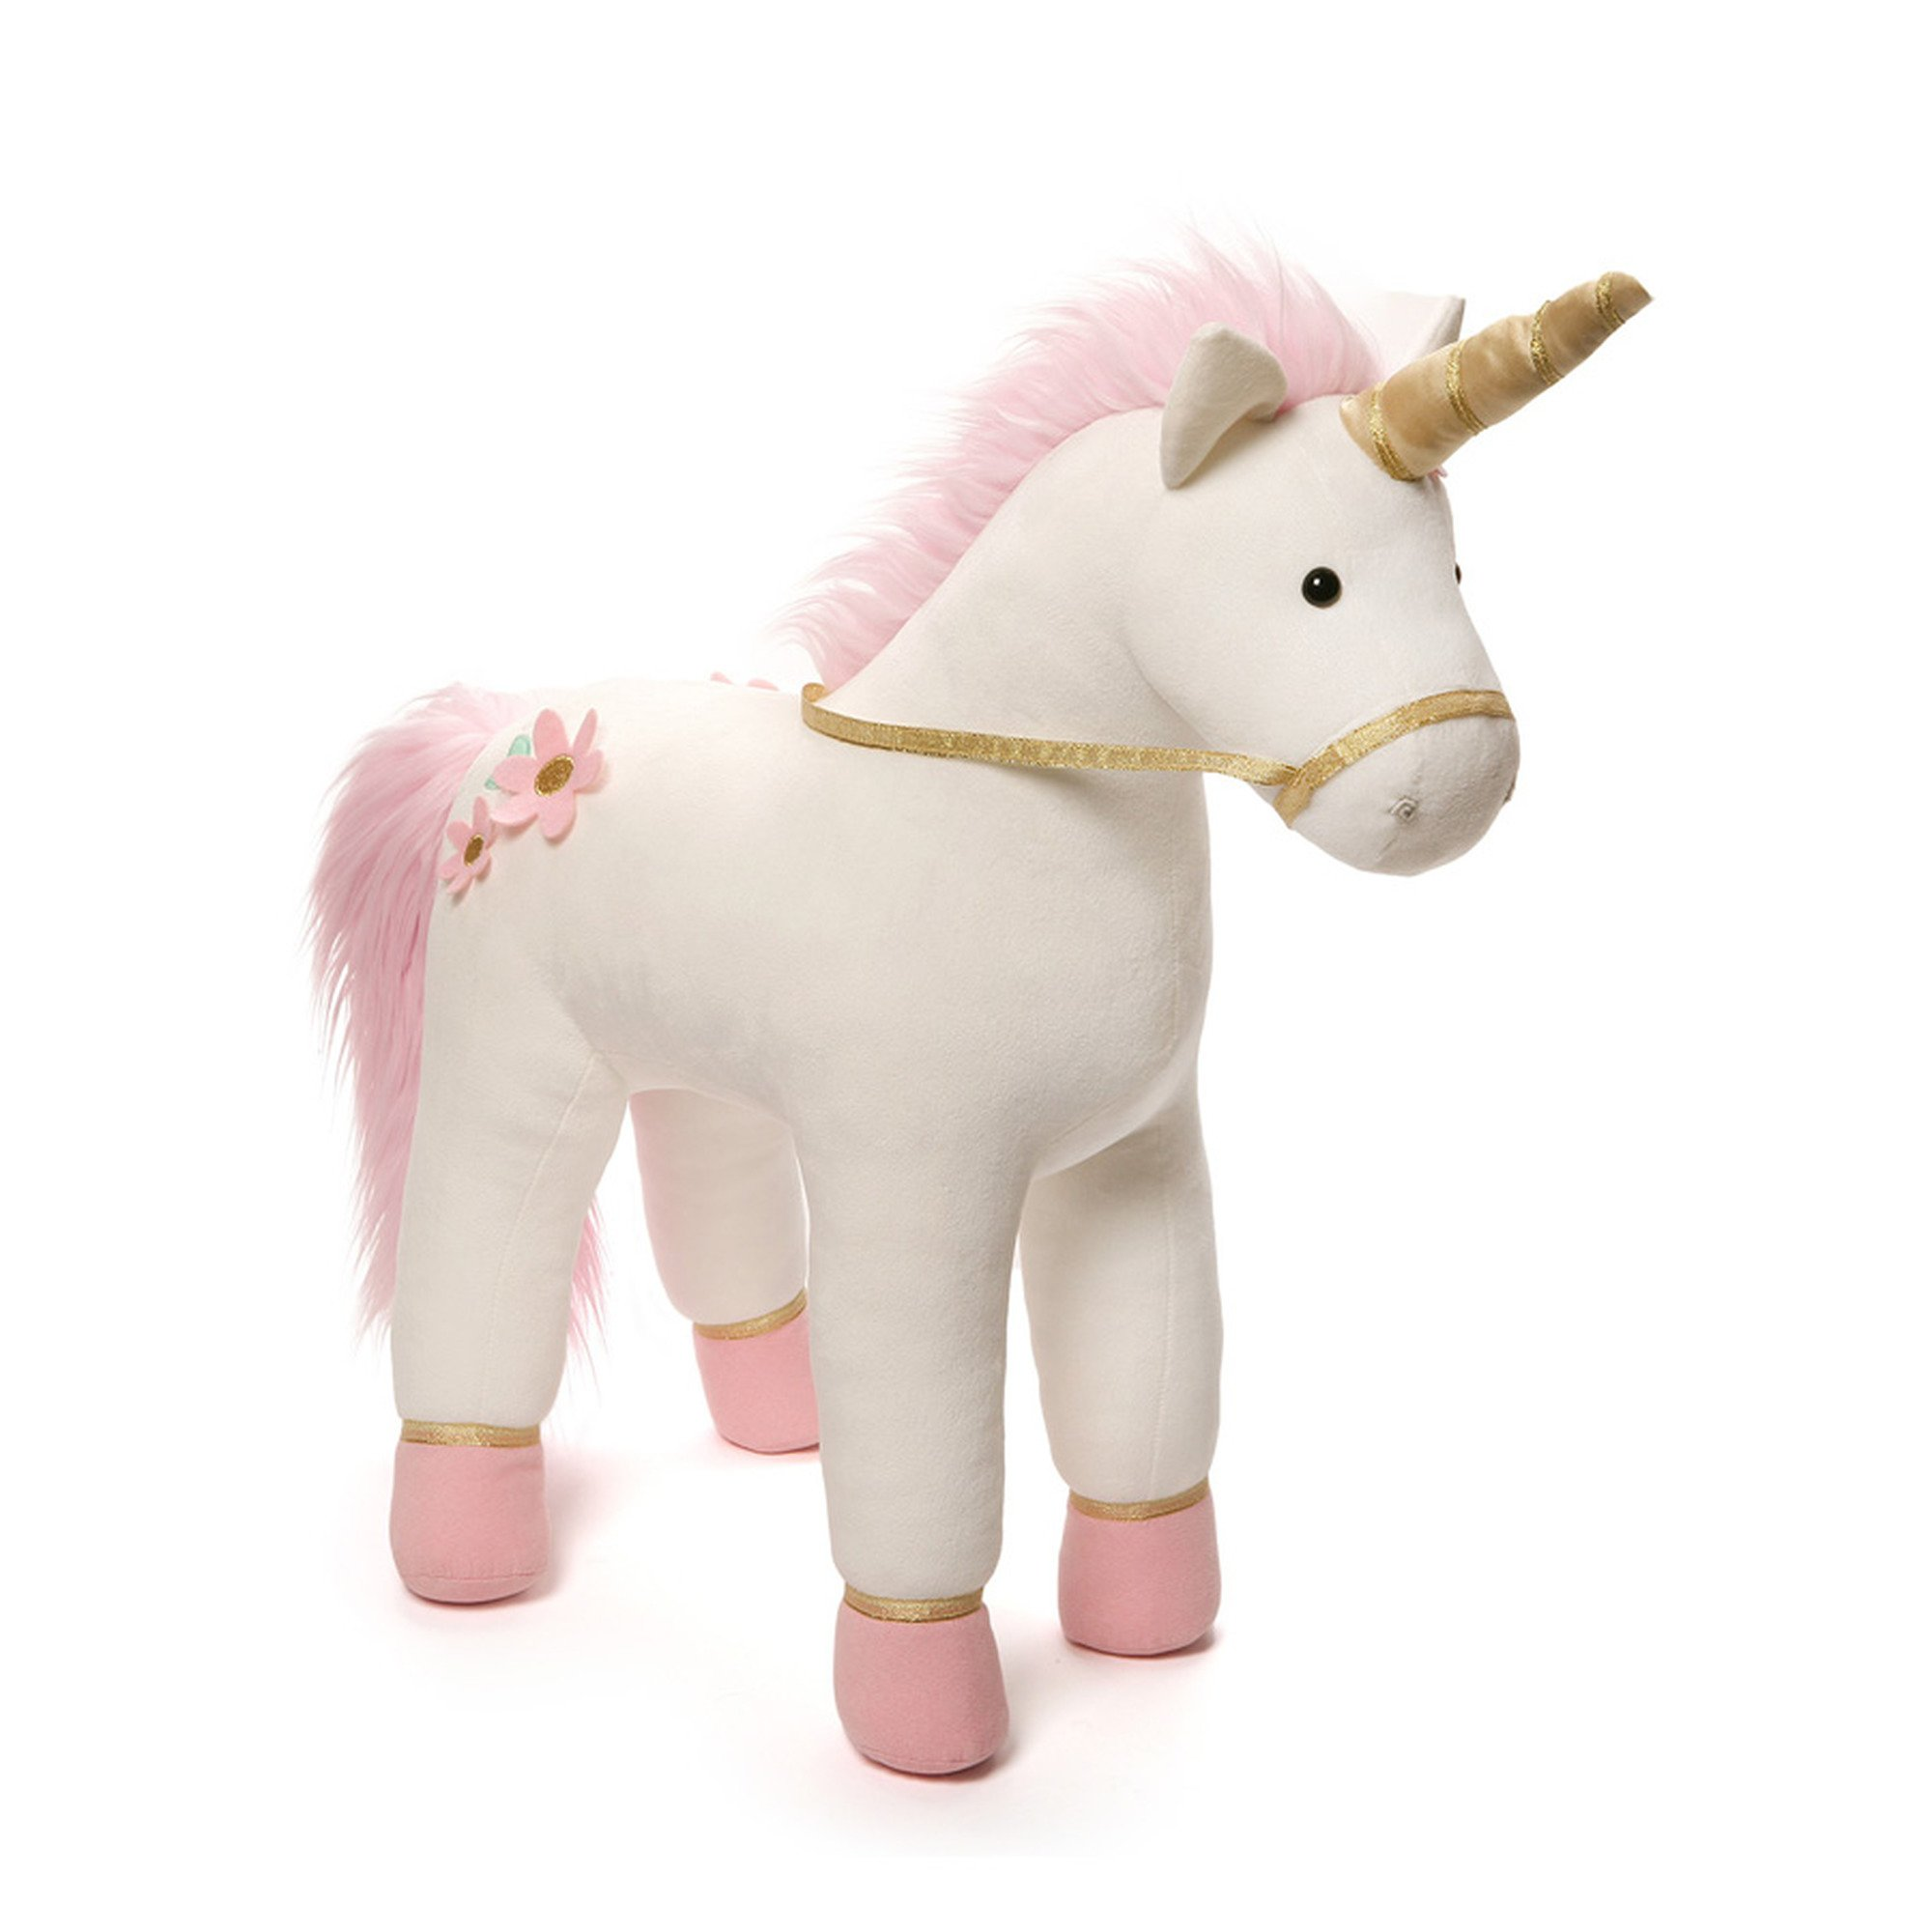 GUND Lilyrose Unicorn Jumbo Stuffed Animal Plush, 23'' by GUND